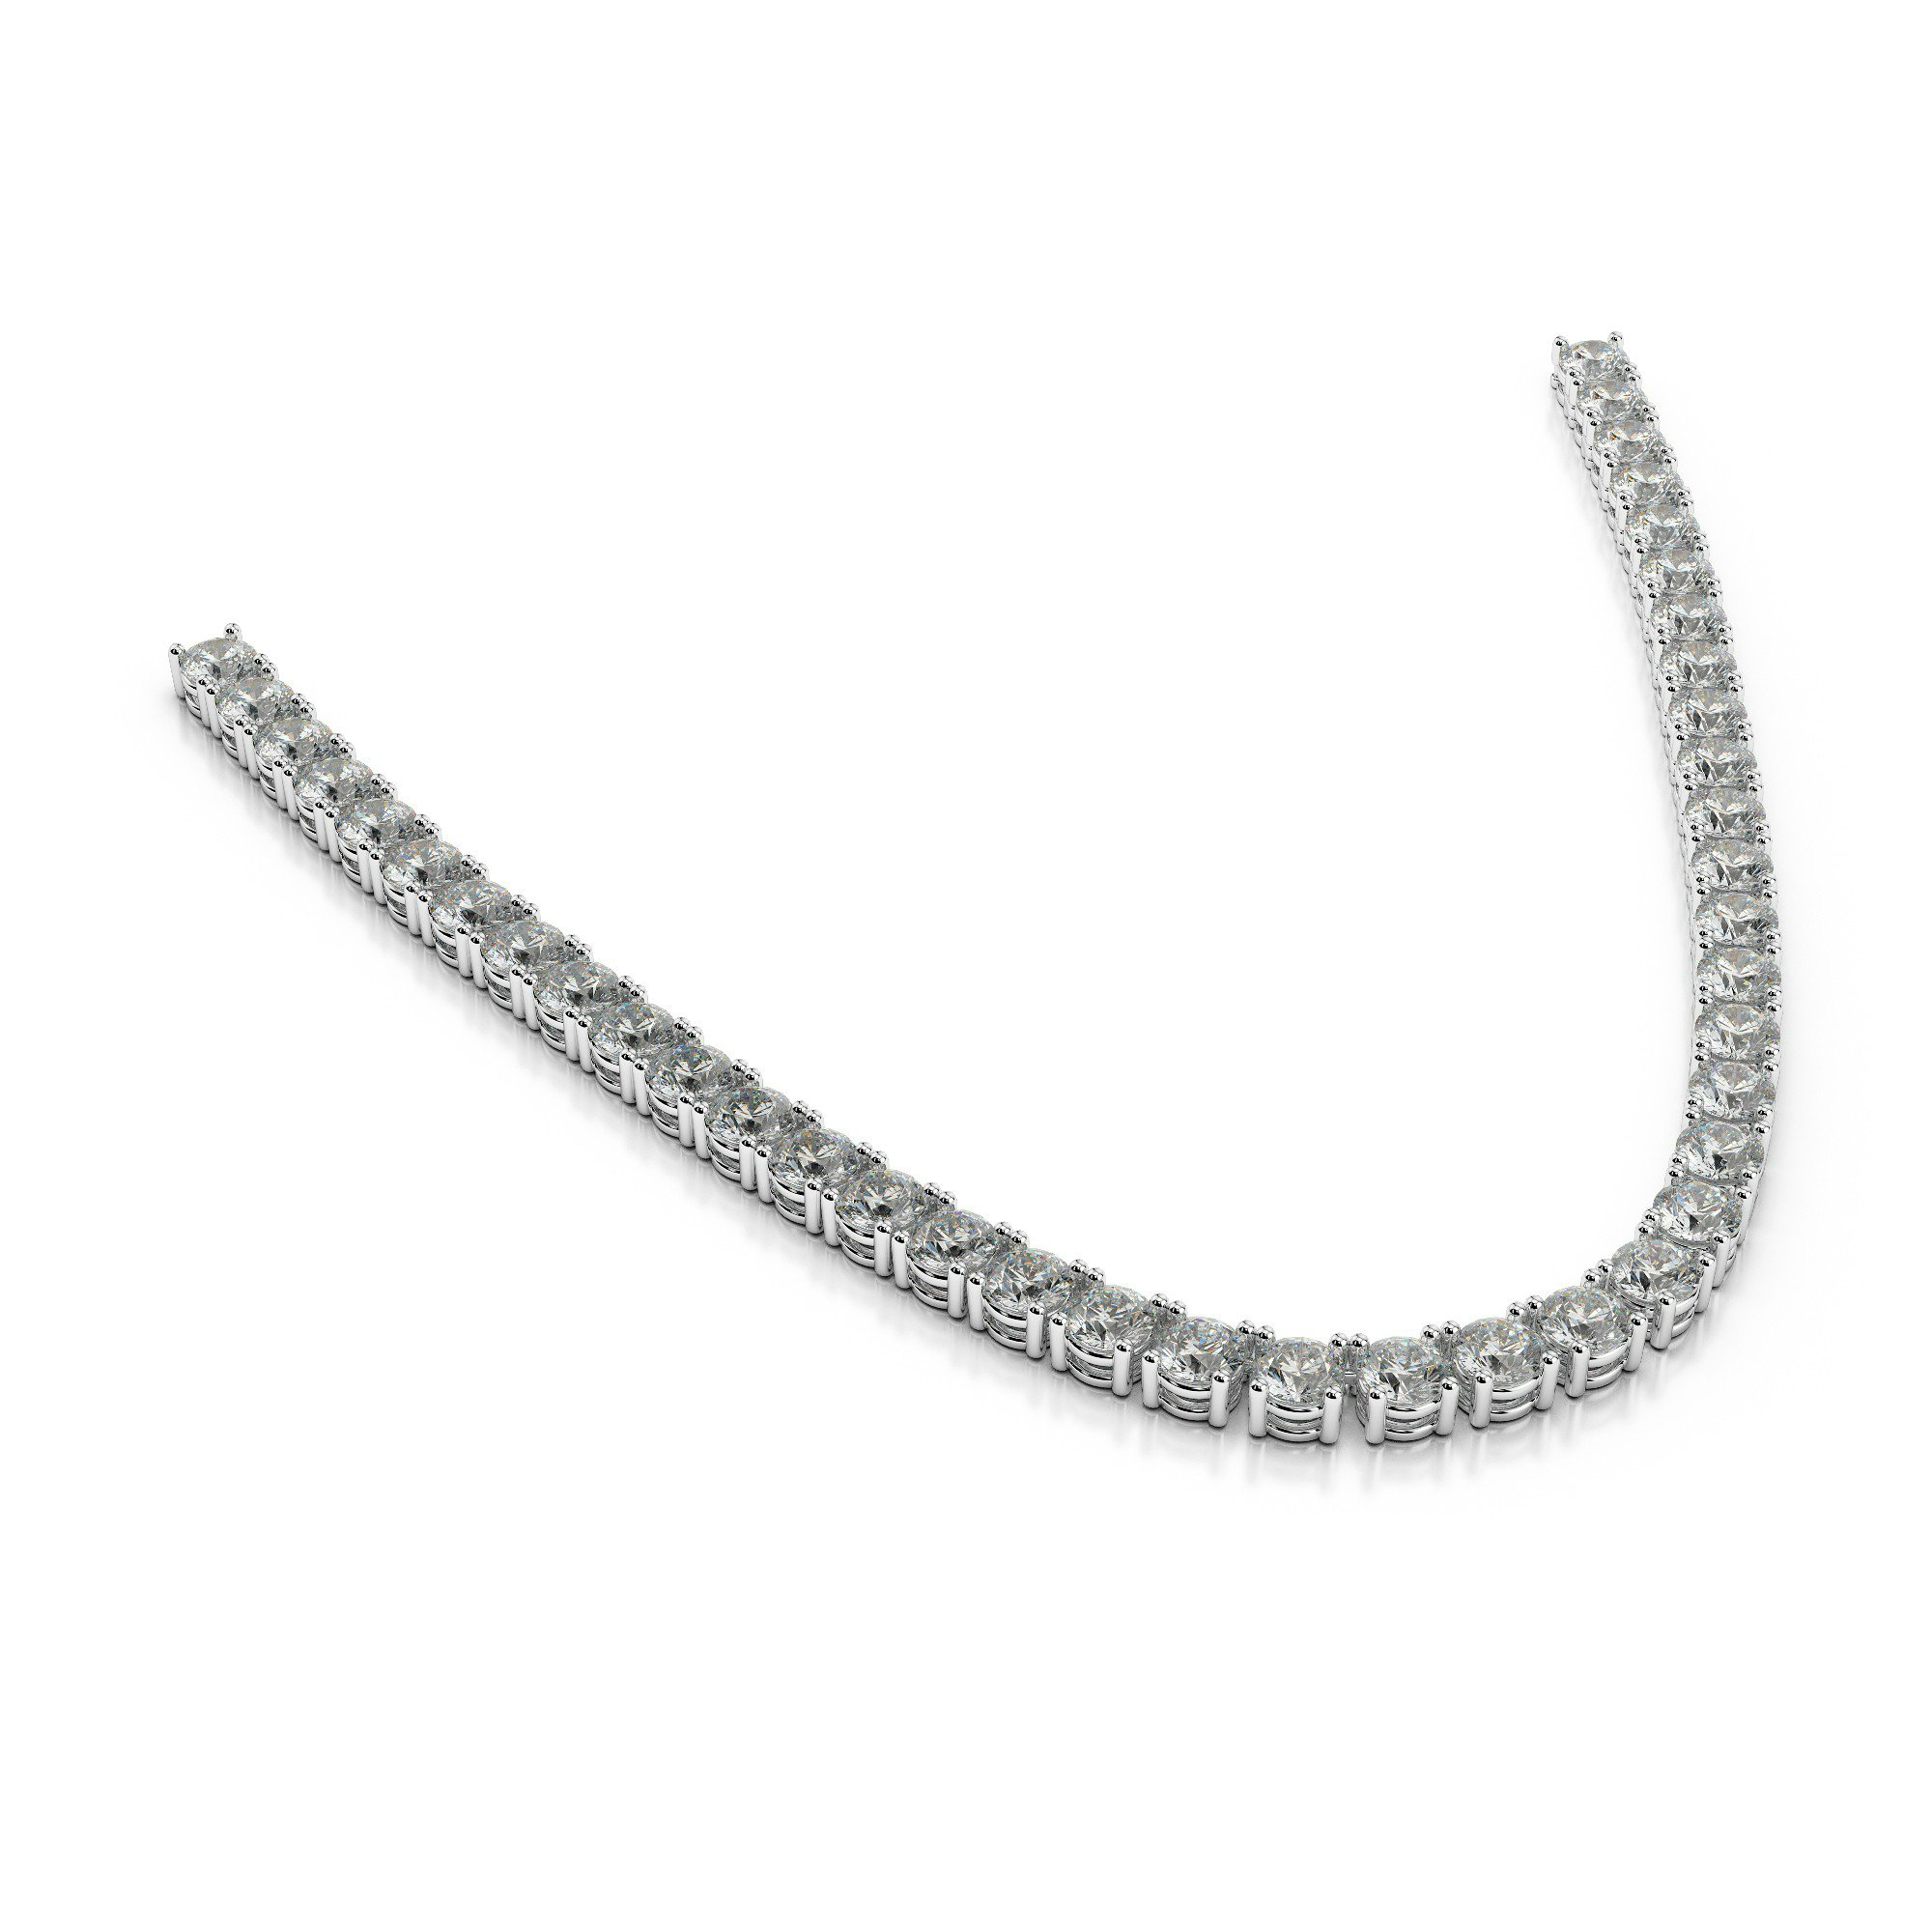 40 Carat Harro Moissanite Tennis Necklace